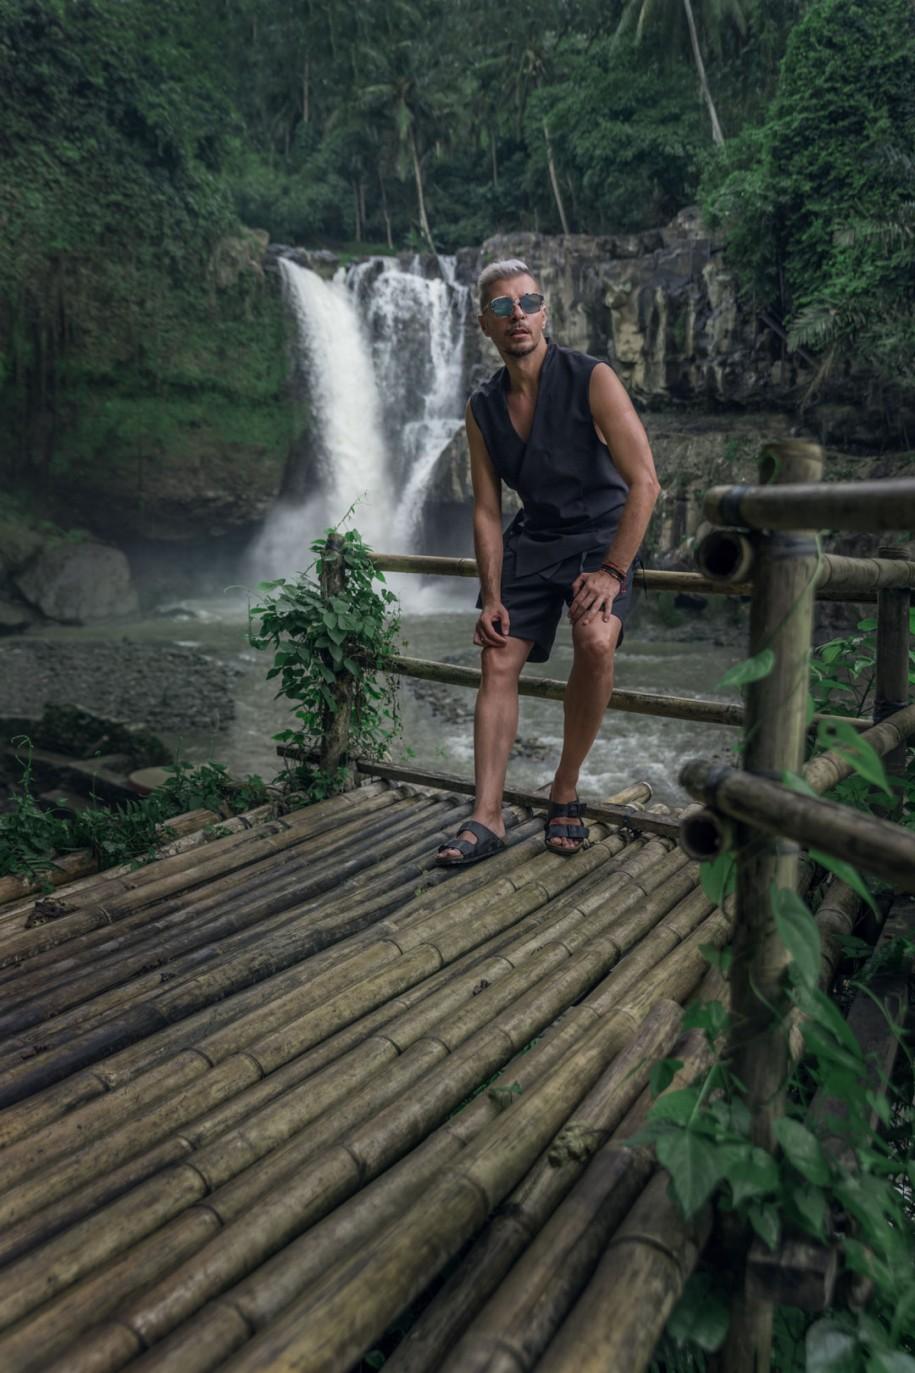 Ovidiu Muresanu Bali Waterfalls